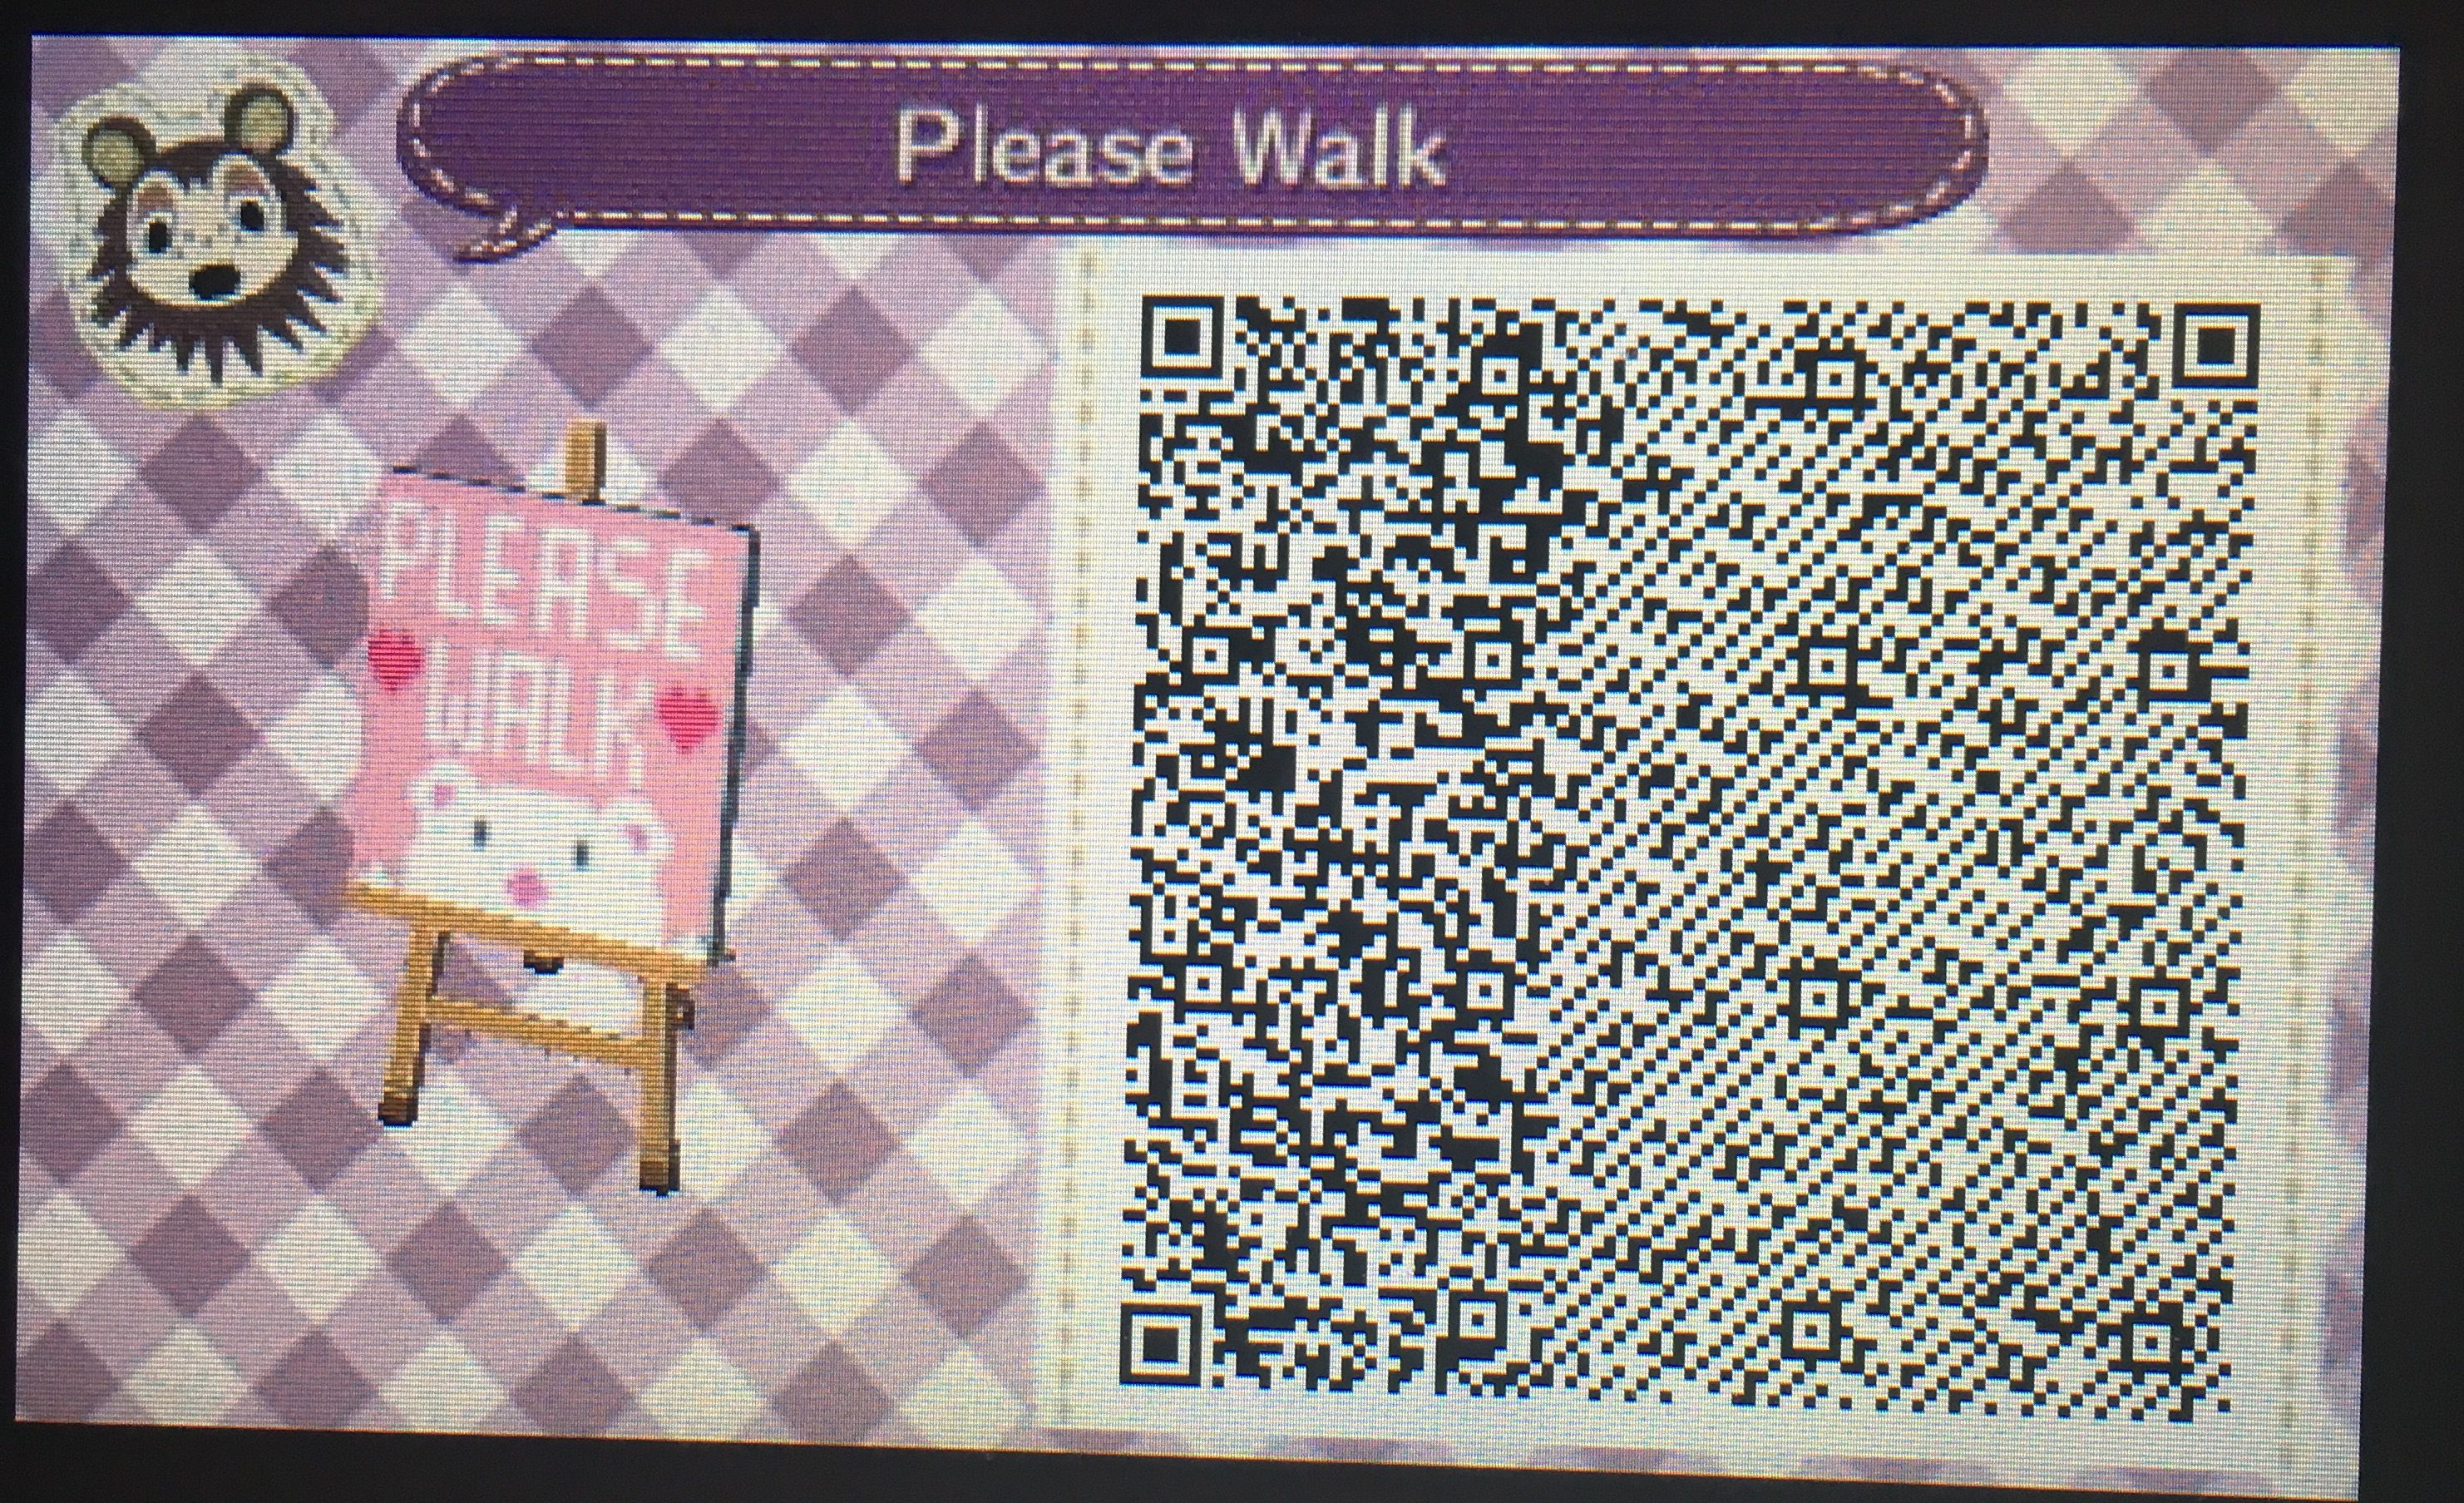 So cute please walk sign for acnl 💕💕💕 Animal crossing qr